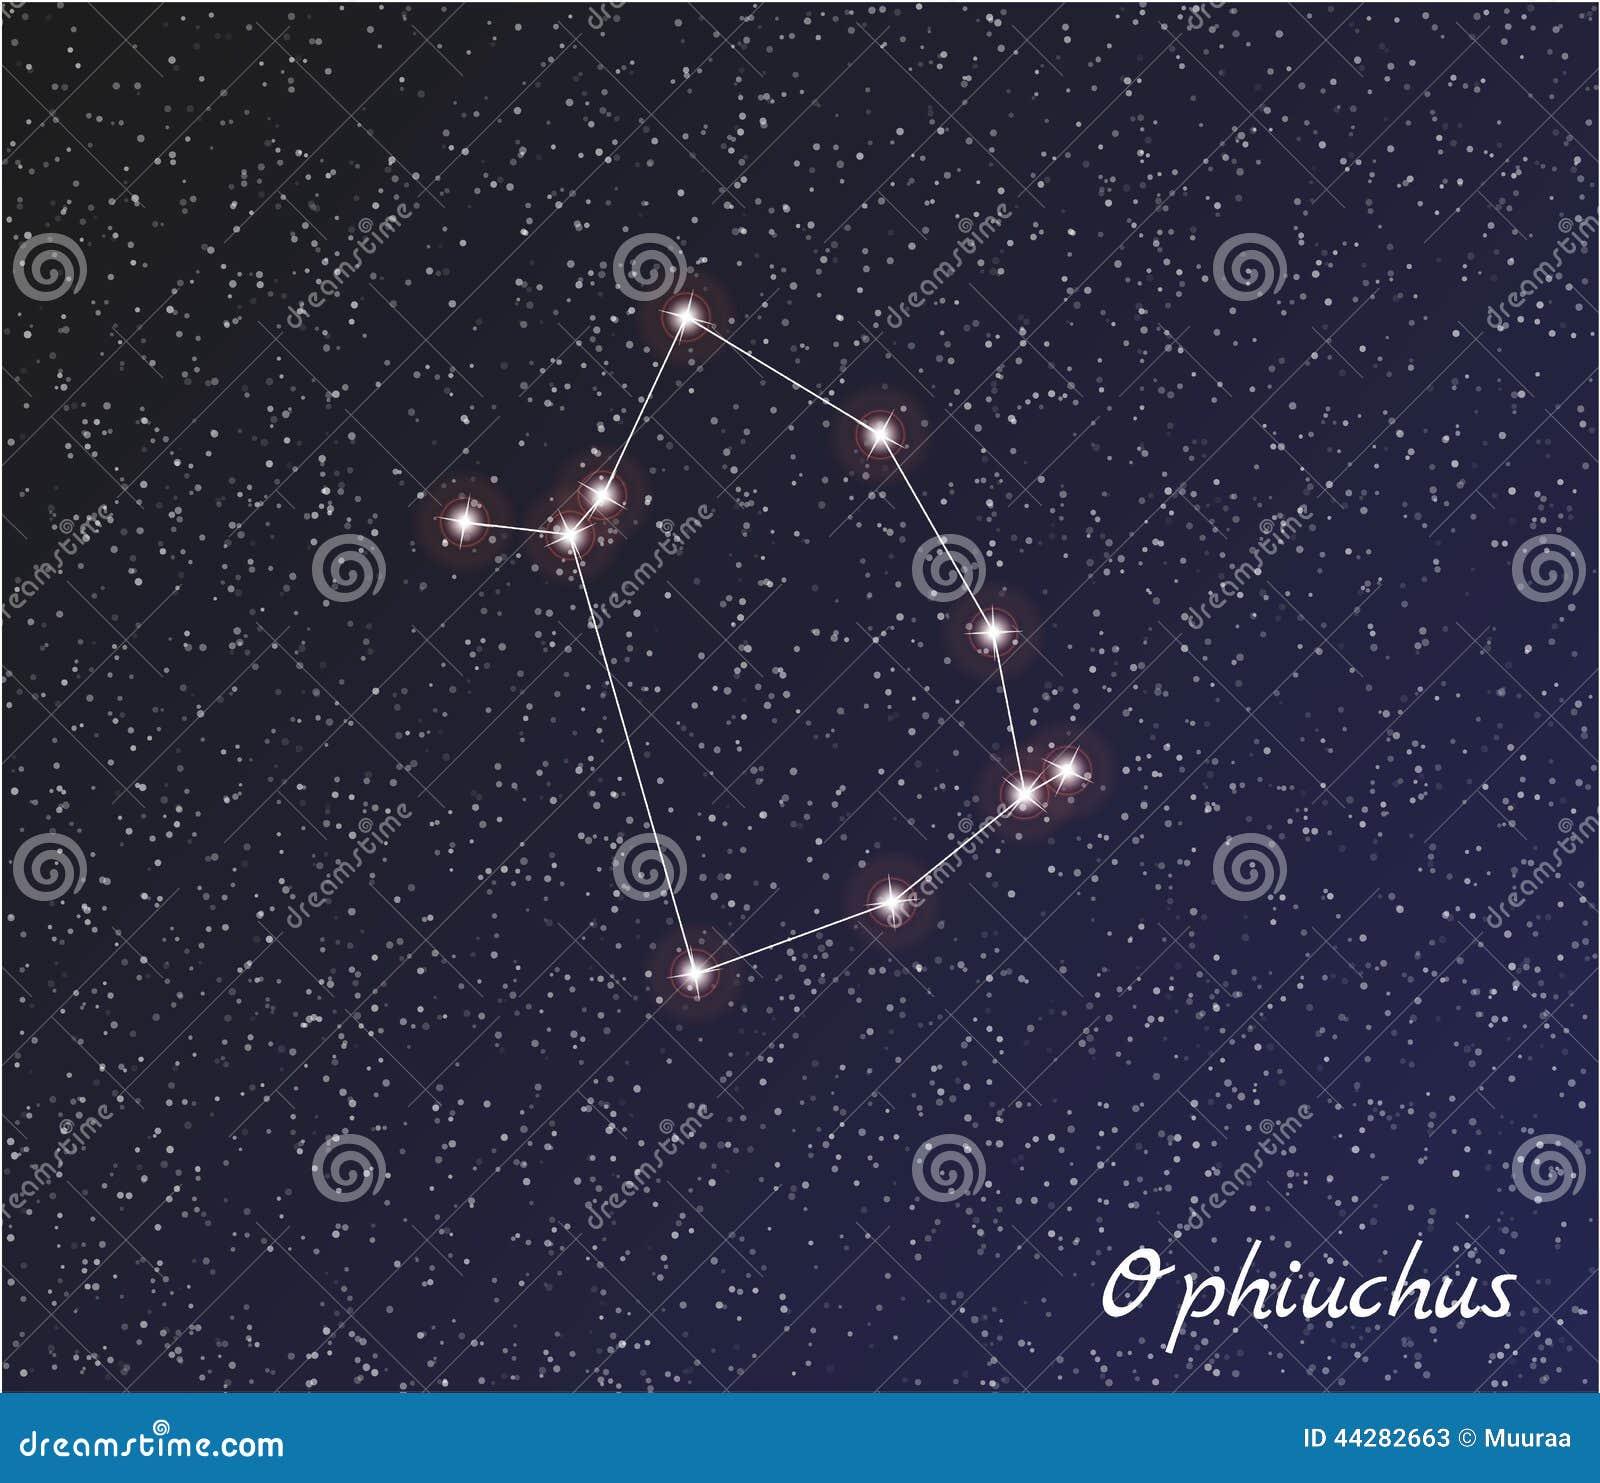 constellation ophiuchus stock vector